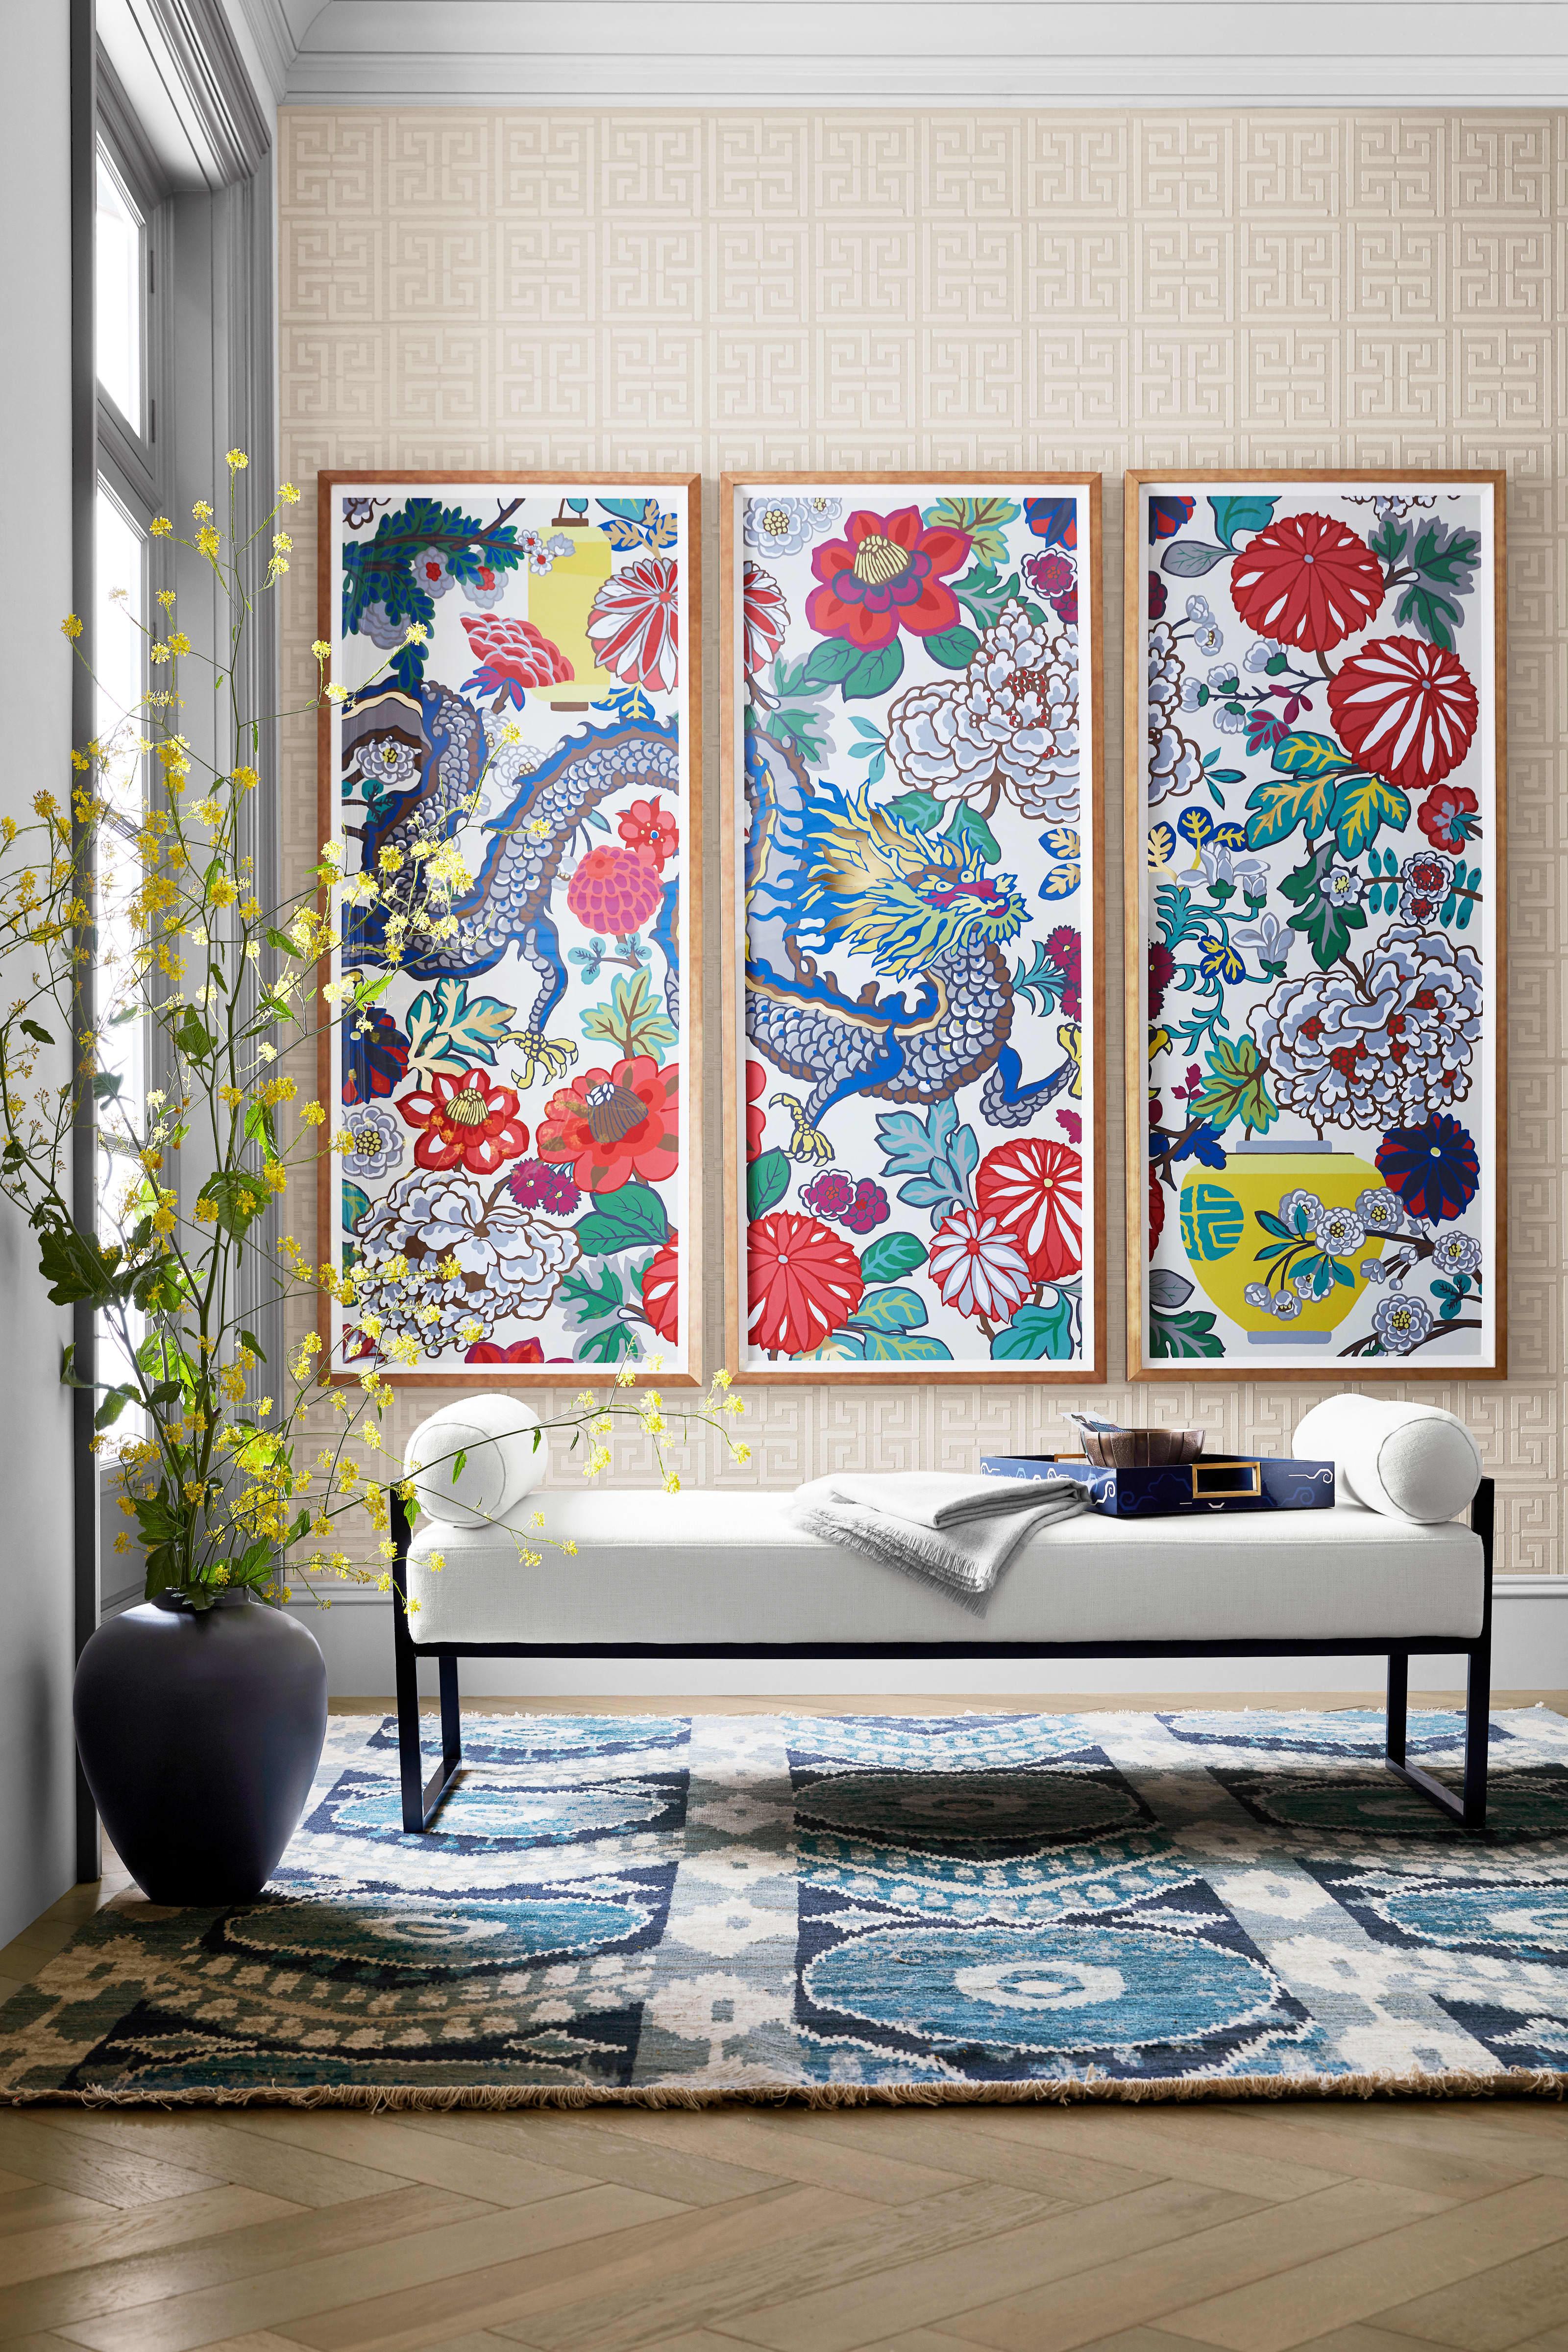 Schumacher X Williams Sonoma Collection Apartment Therapy